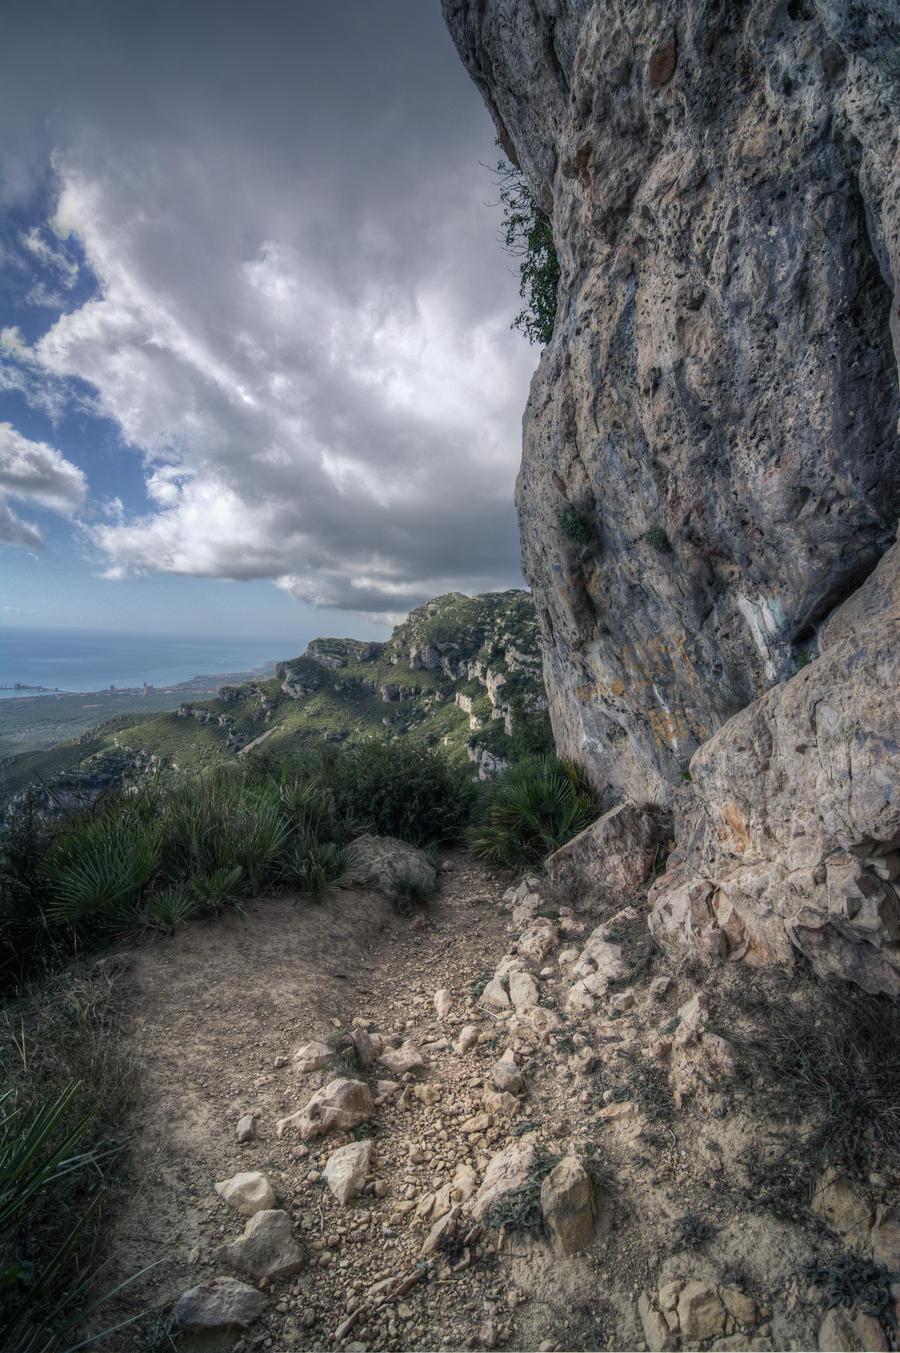 wallpaper mountain path - photo #36